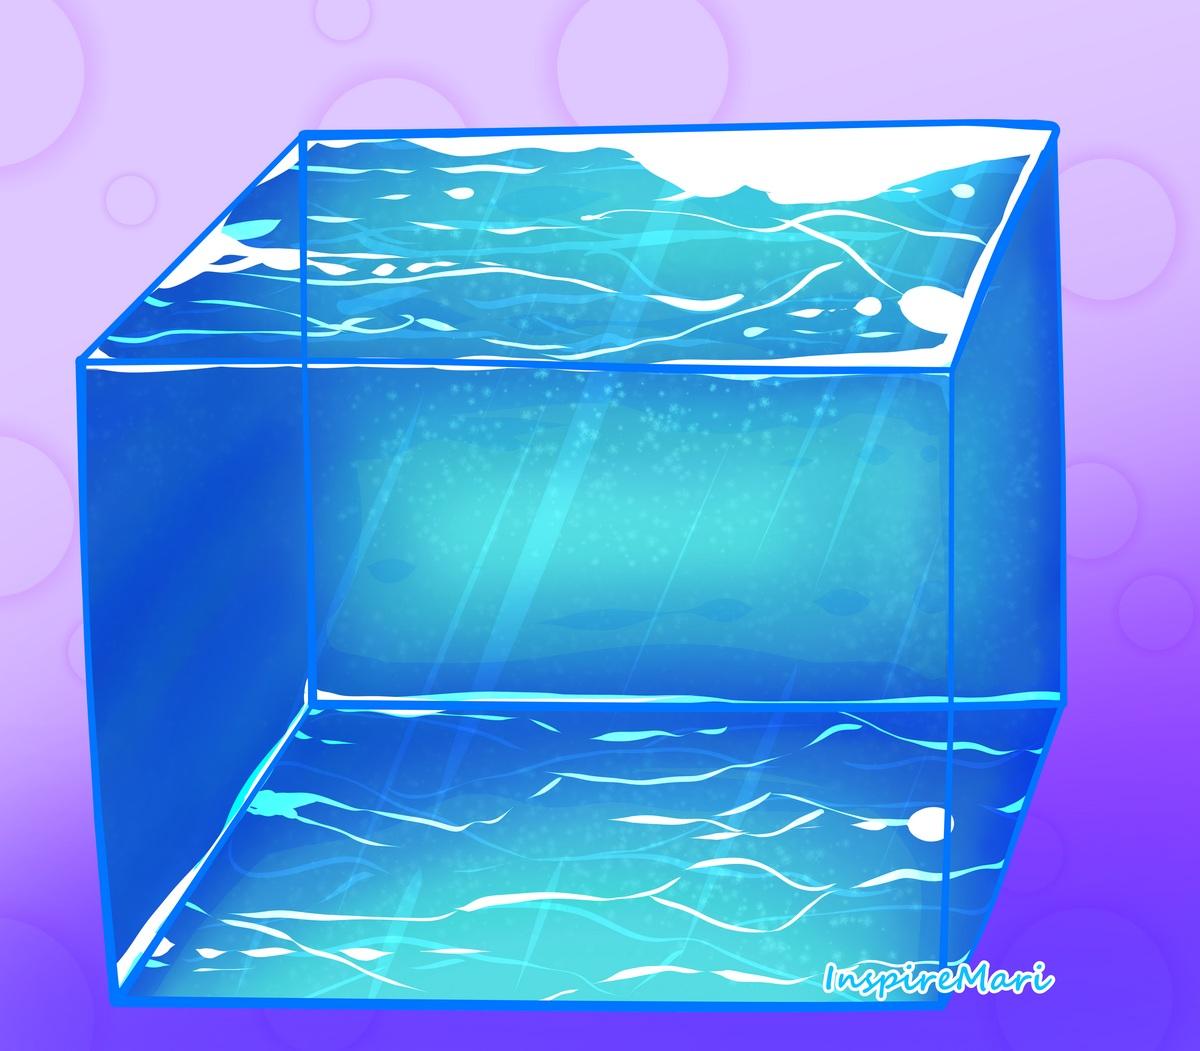 Water Cube art by InspireMari